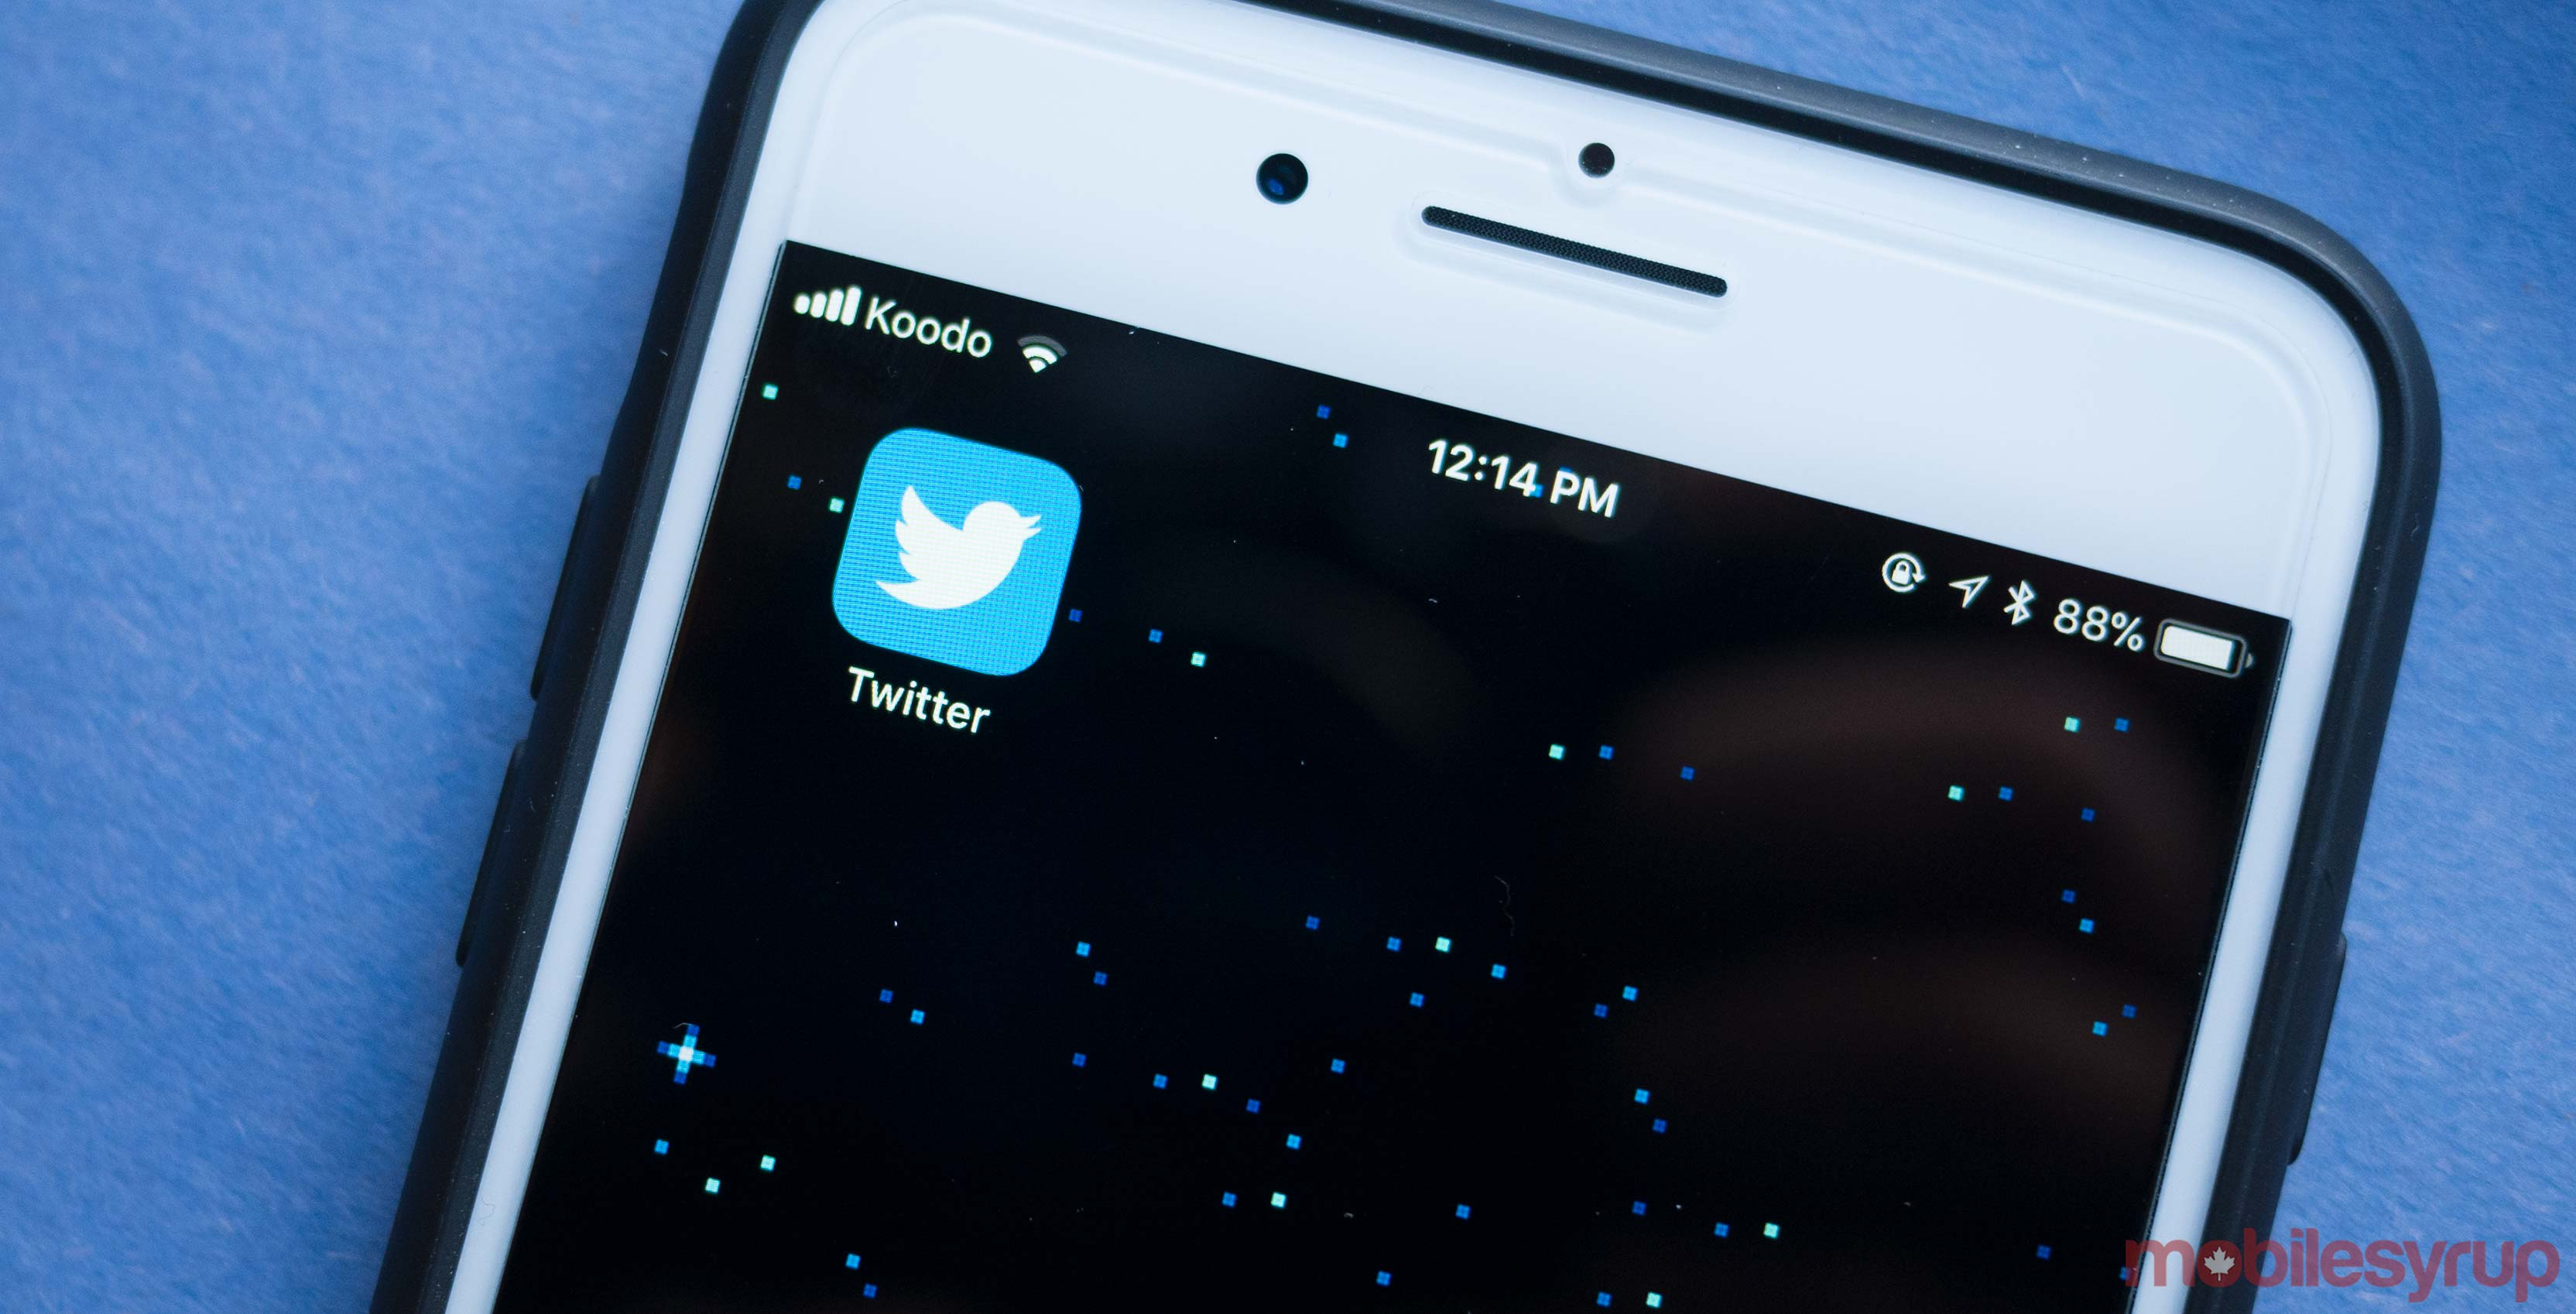 Twitter app on iPhone